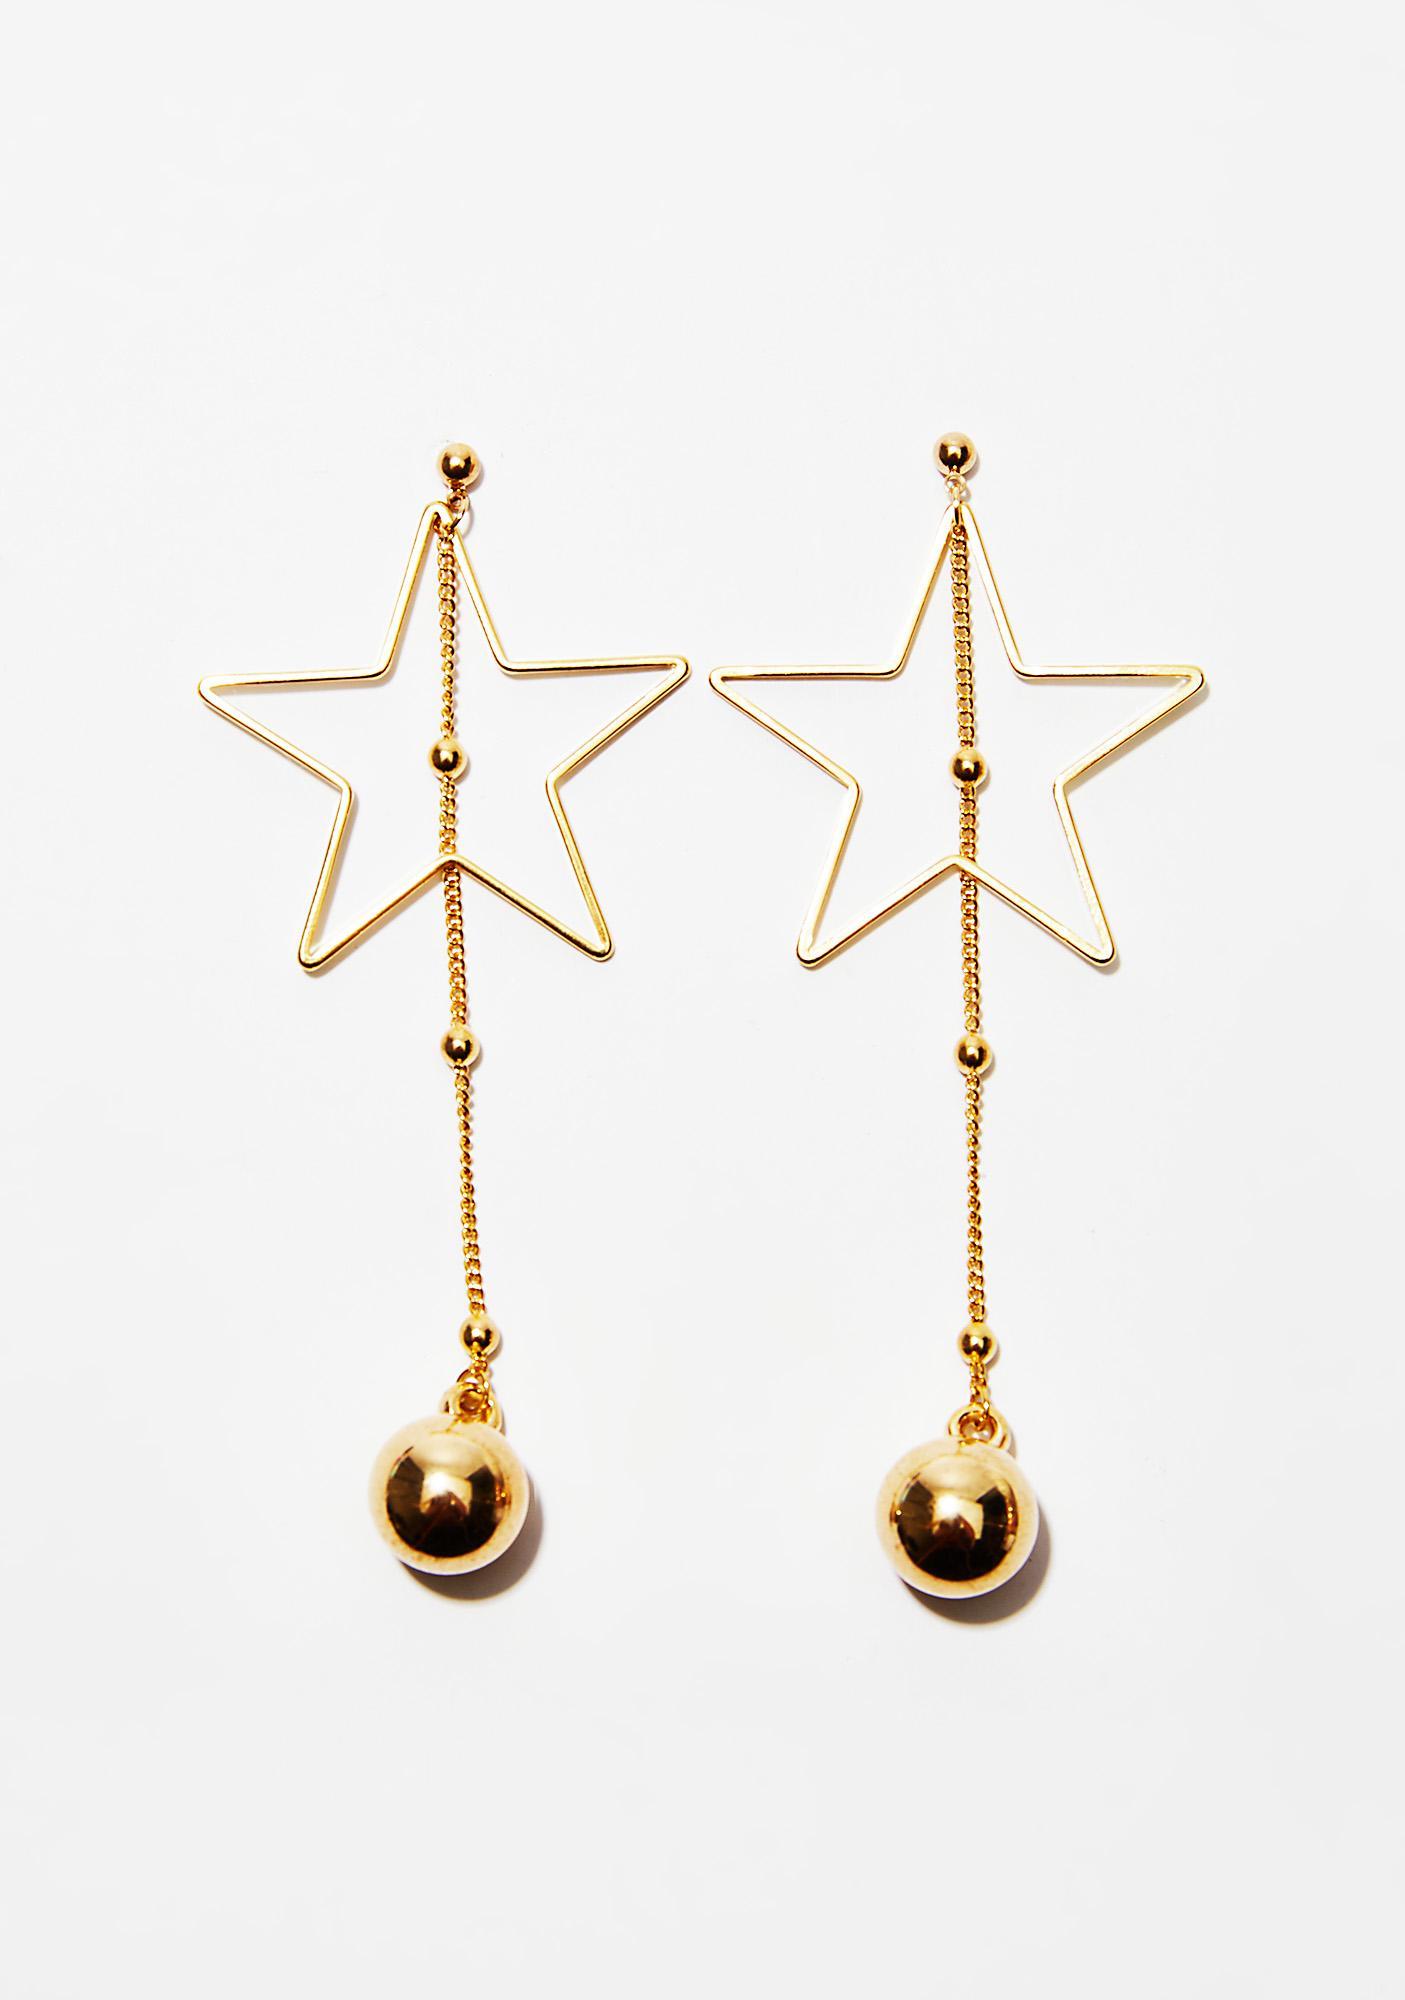 Star Lit Up Earrings